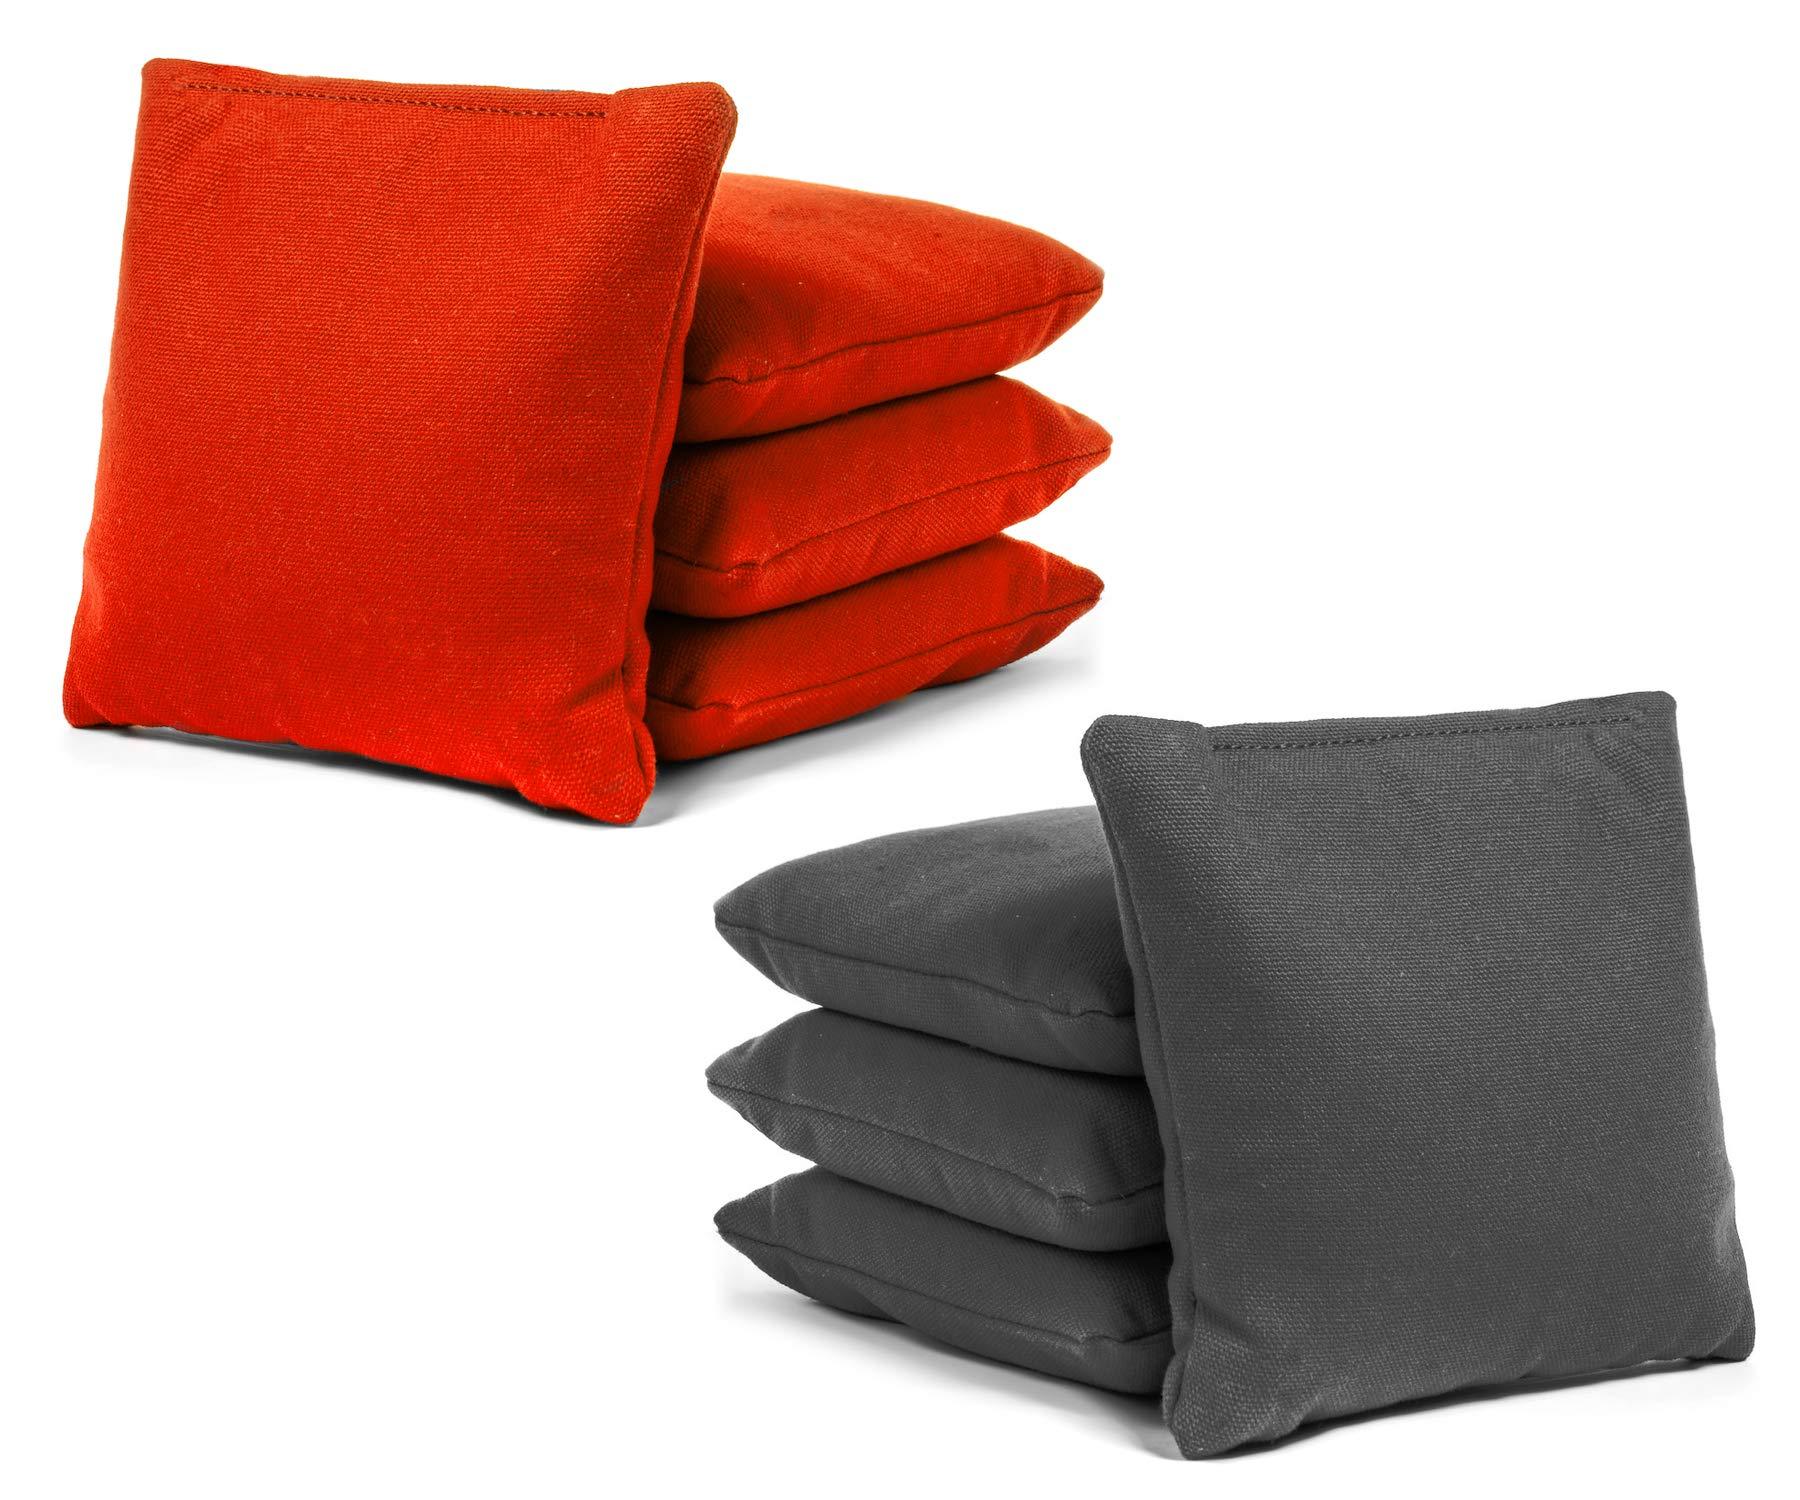 Tailgating Pros Cornhole Bags - 8 Regulation Size Corn Hole Bags - 25+ Colors Options by Tailgating Pros